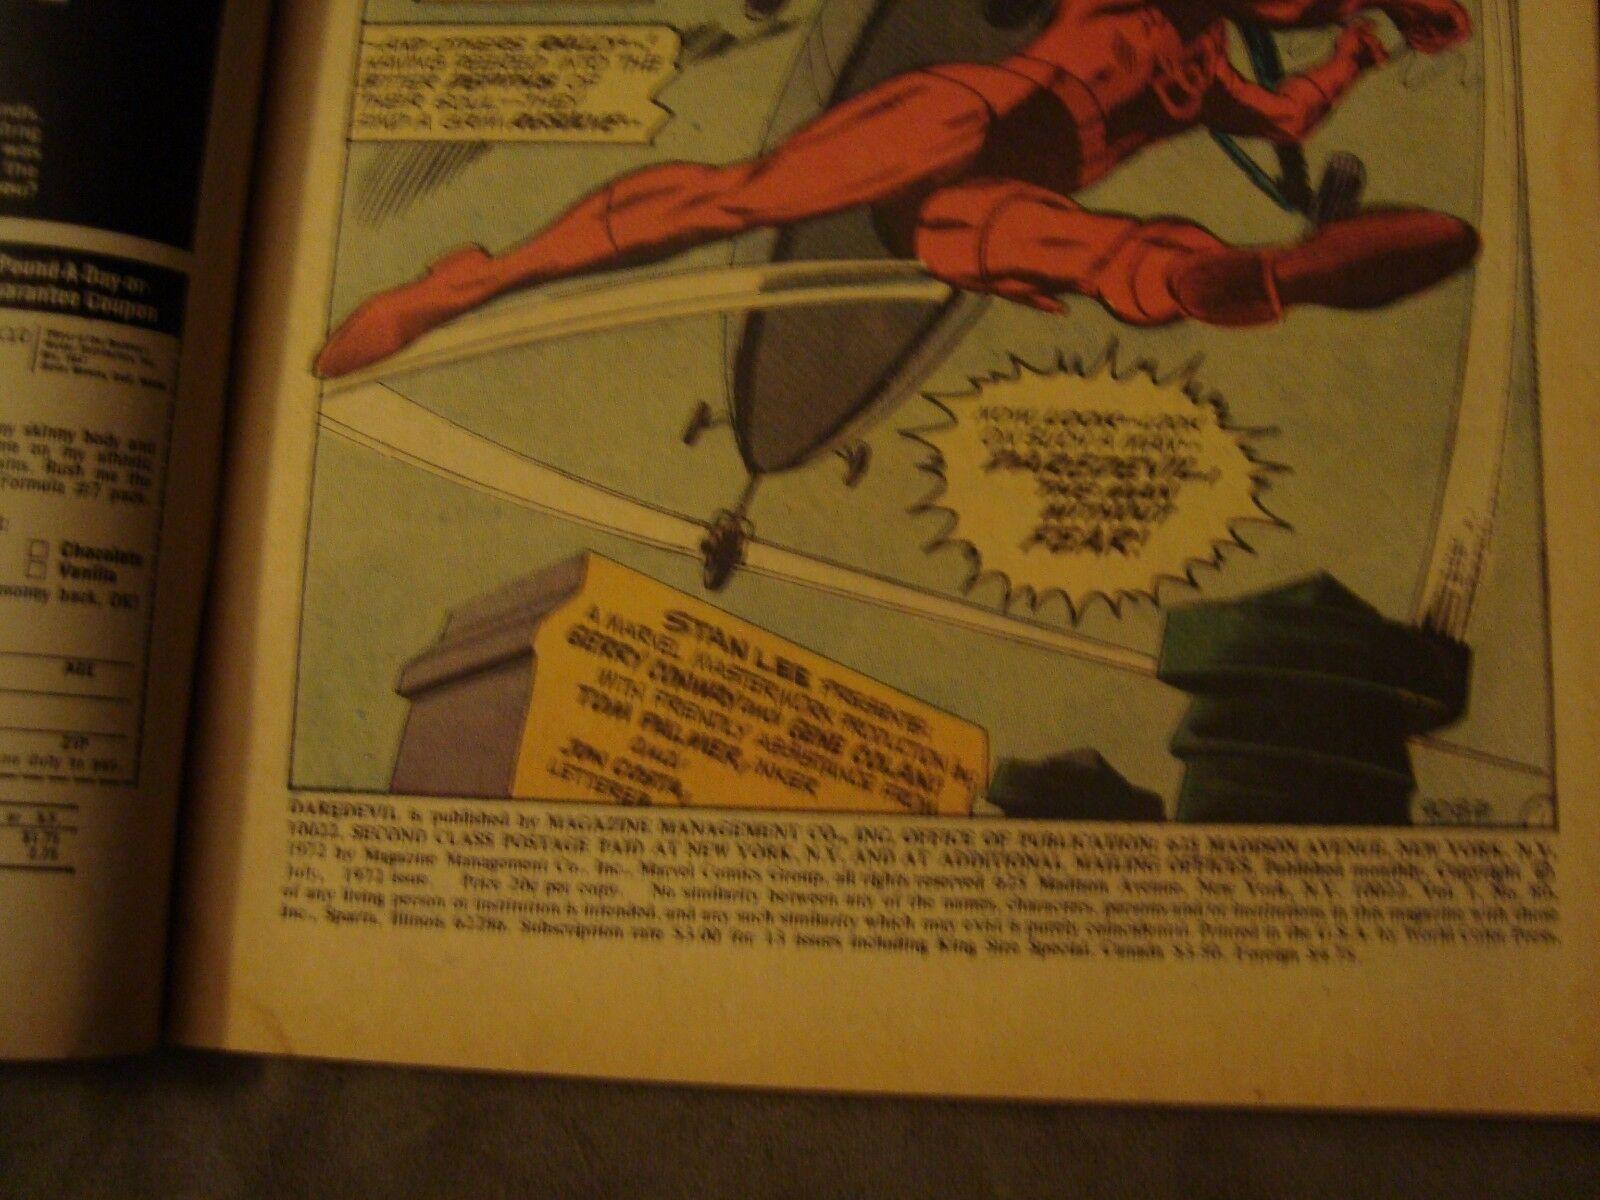 DAREDEVIL #89 FN Condition 1973 Original Marvel Comic Book Crisis In The Sky